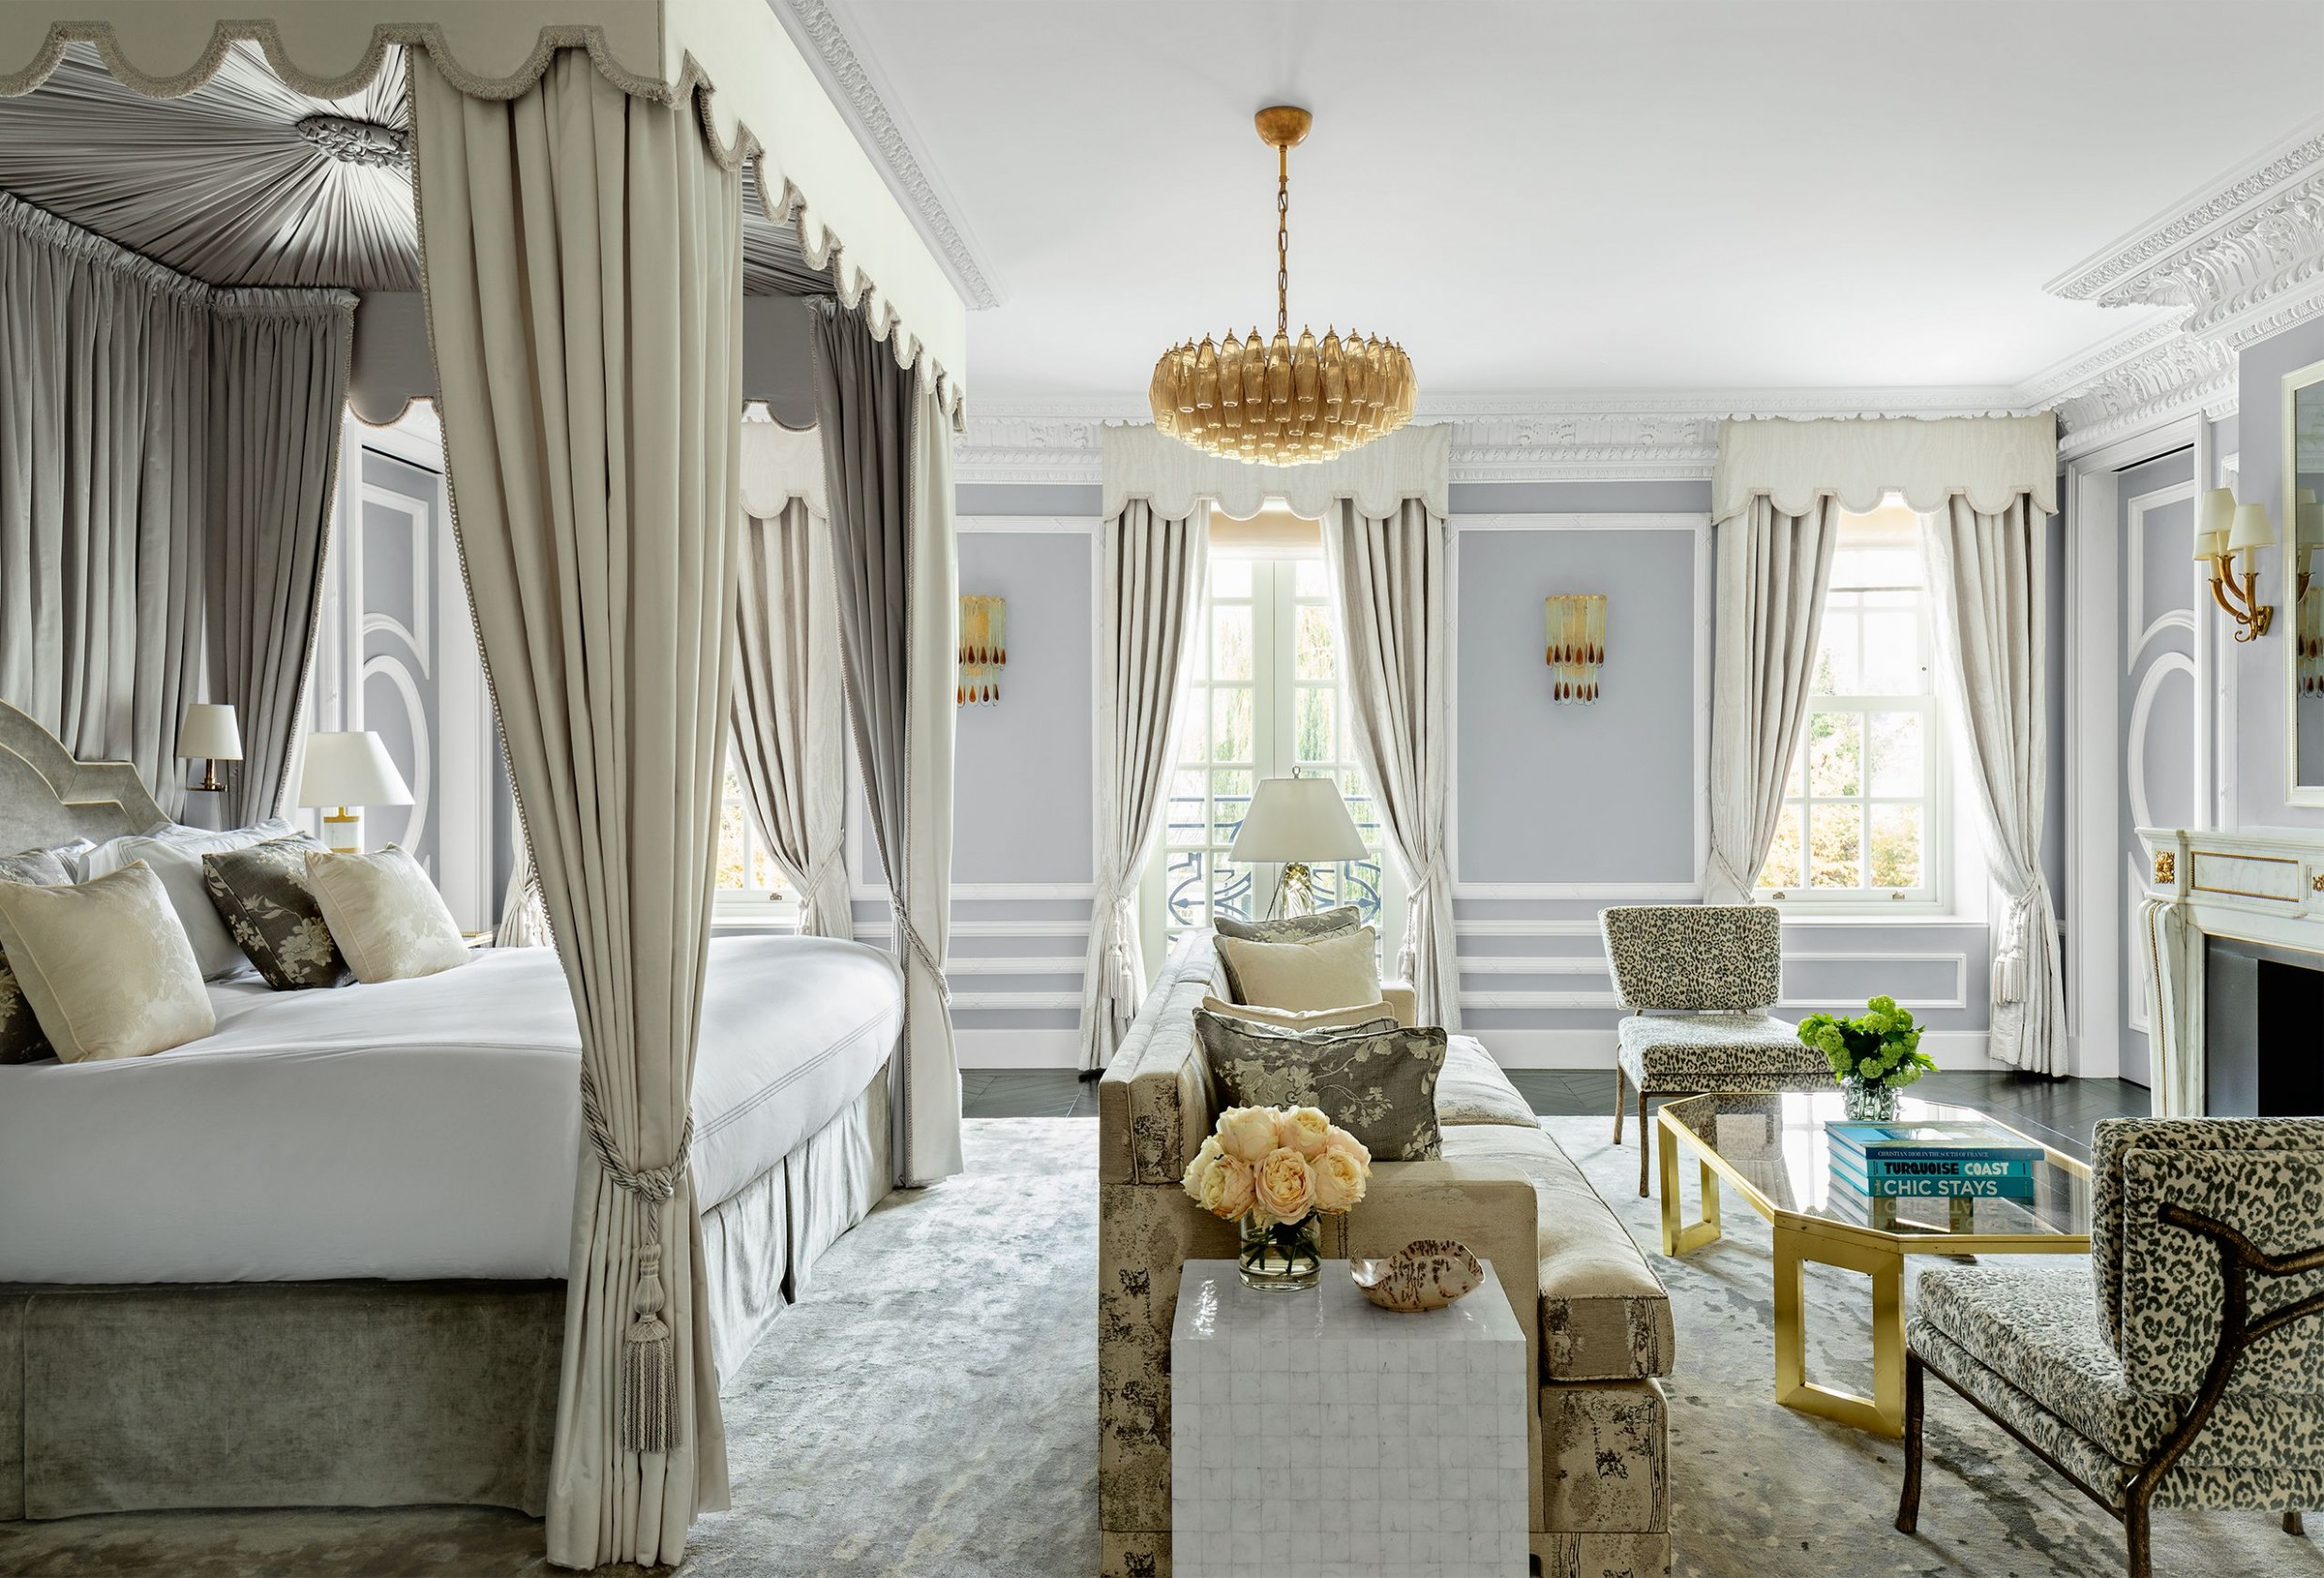 Best Bedroom Curtains - Ideas for Bedroom Window Treatments - Window Valance Ideas For Bedroom